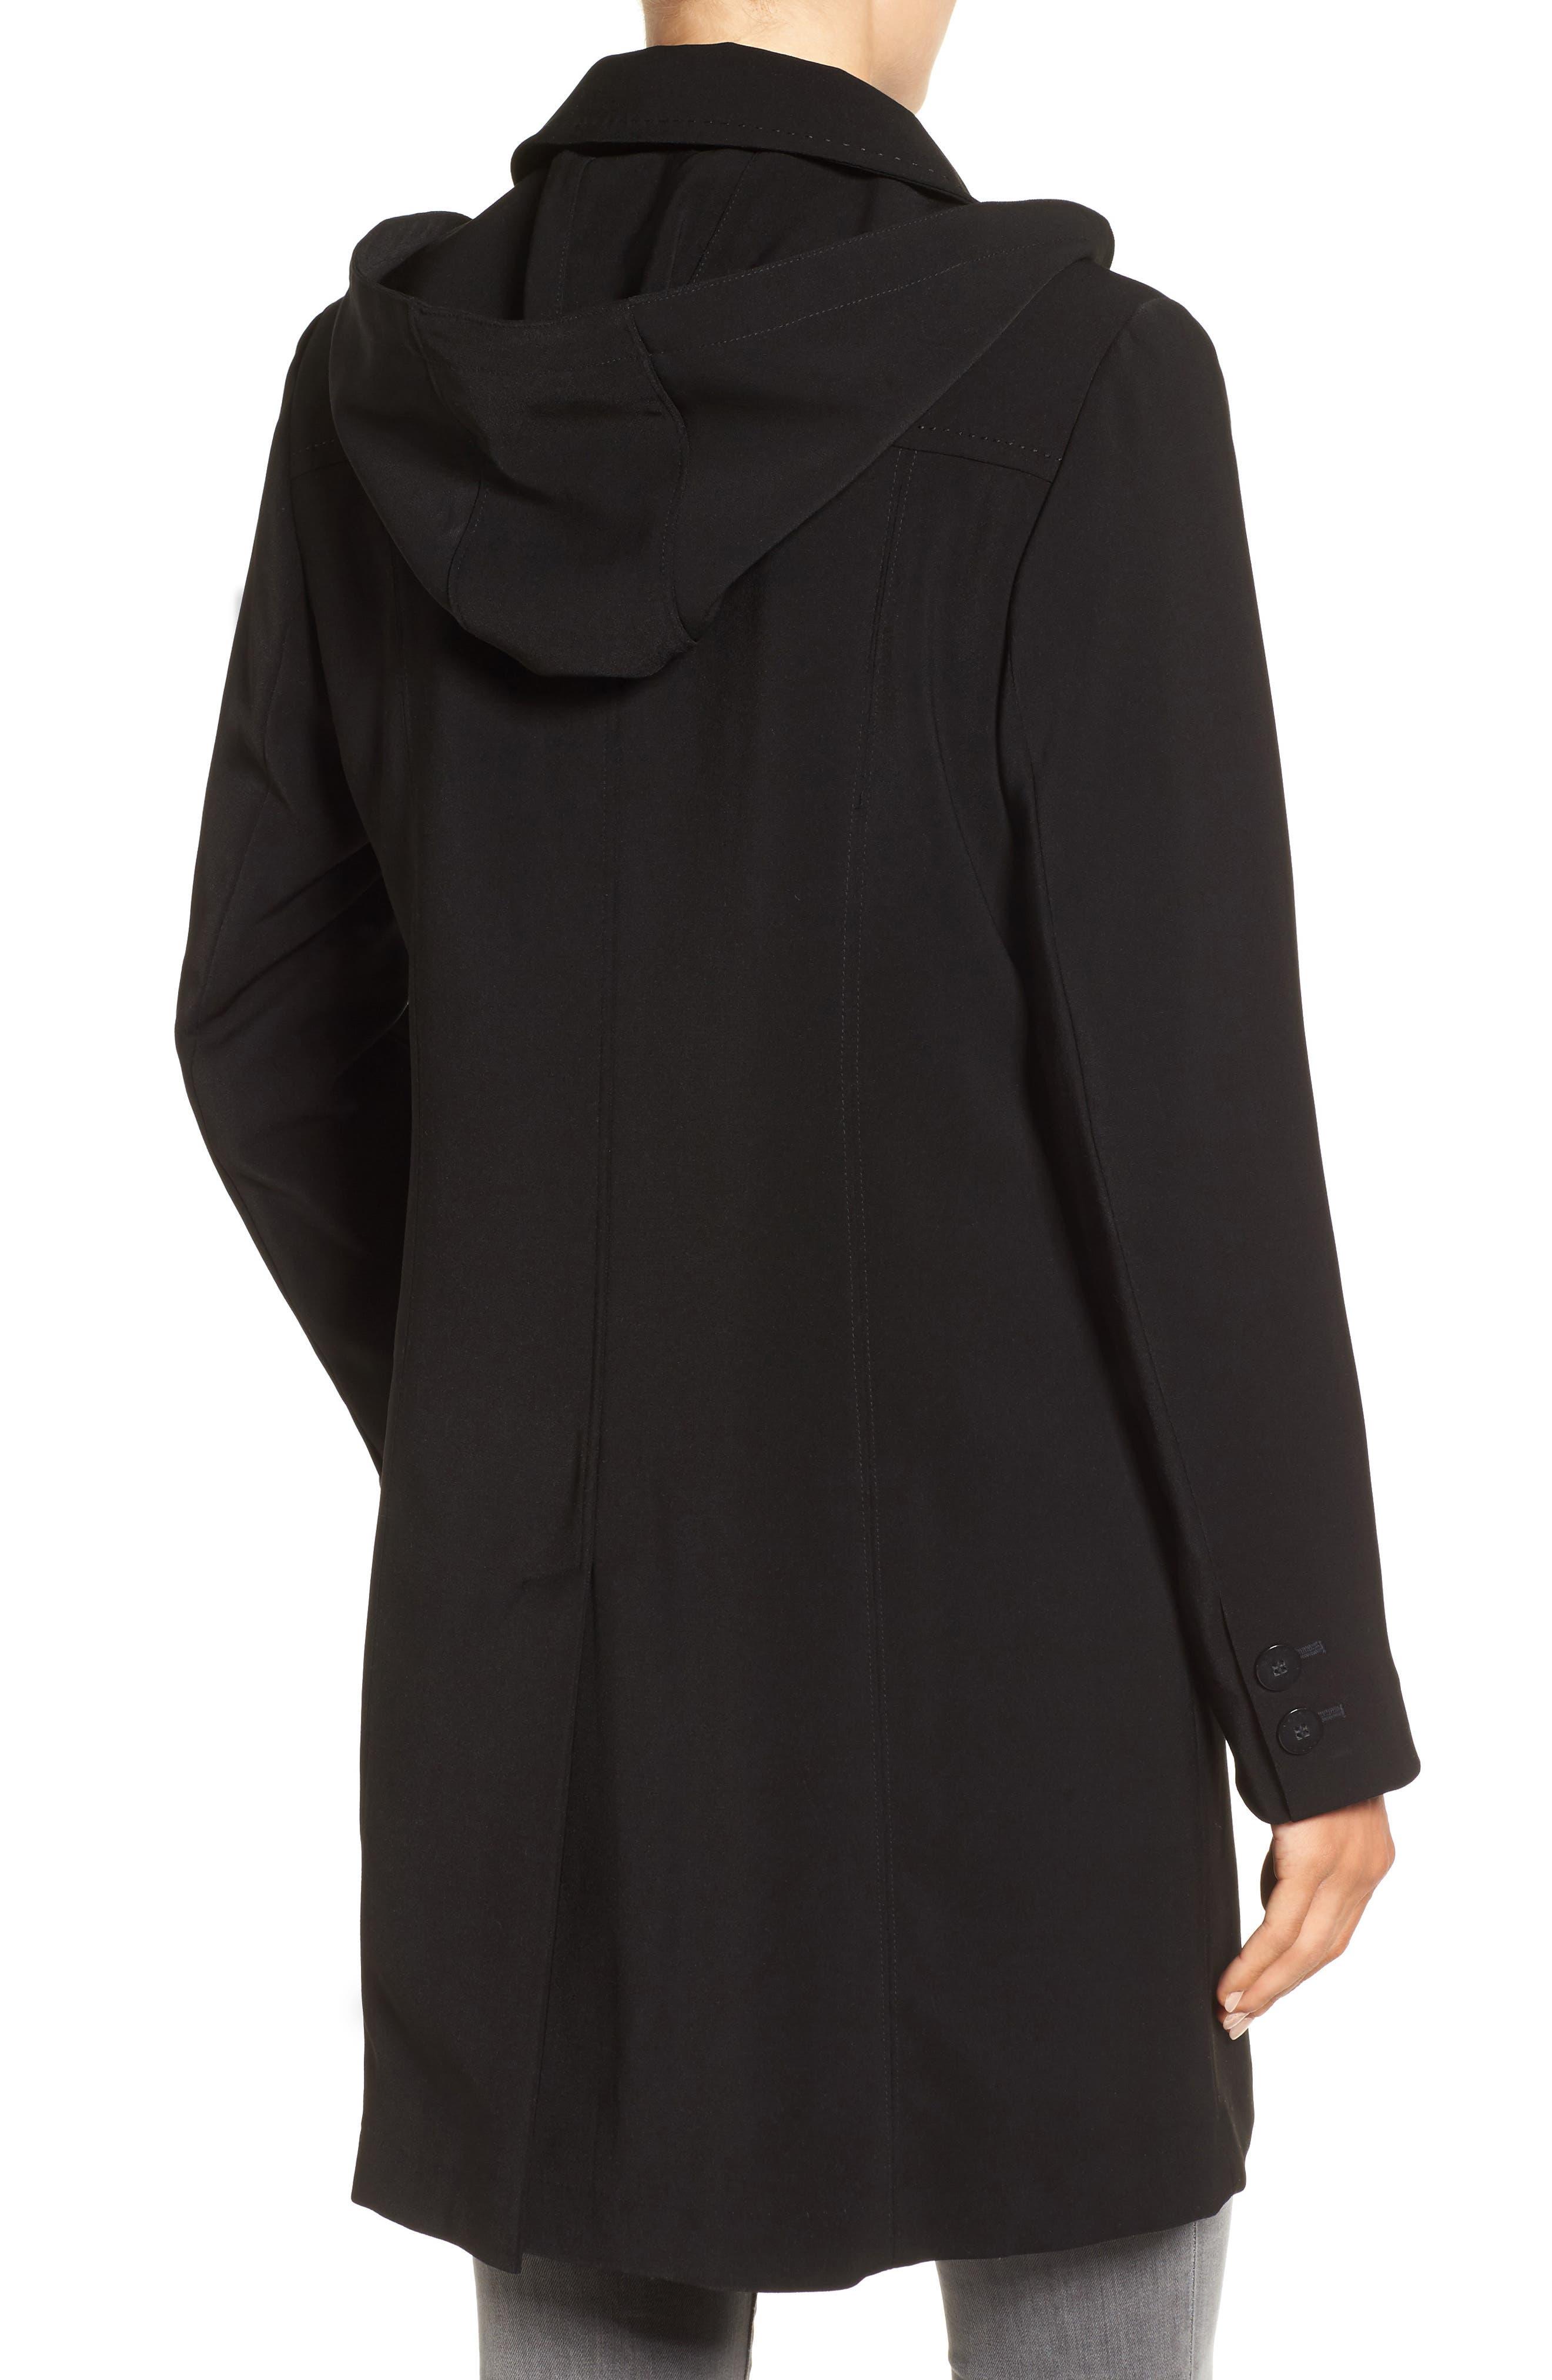 Alternate Image 2  - Gallery Pickstitch Nepage Walking Coat with Detachable Hood (Regular & Petite)